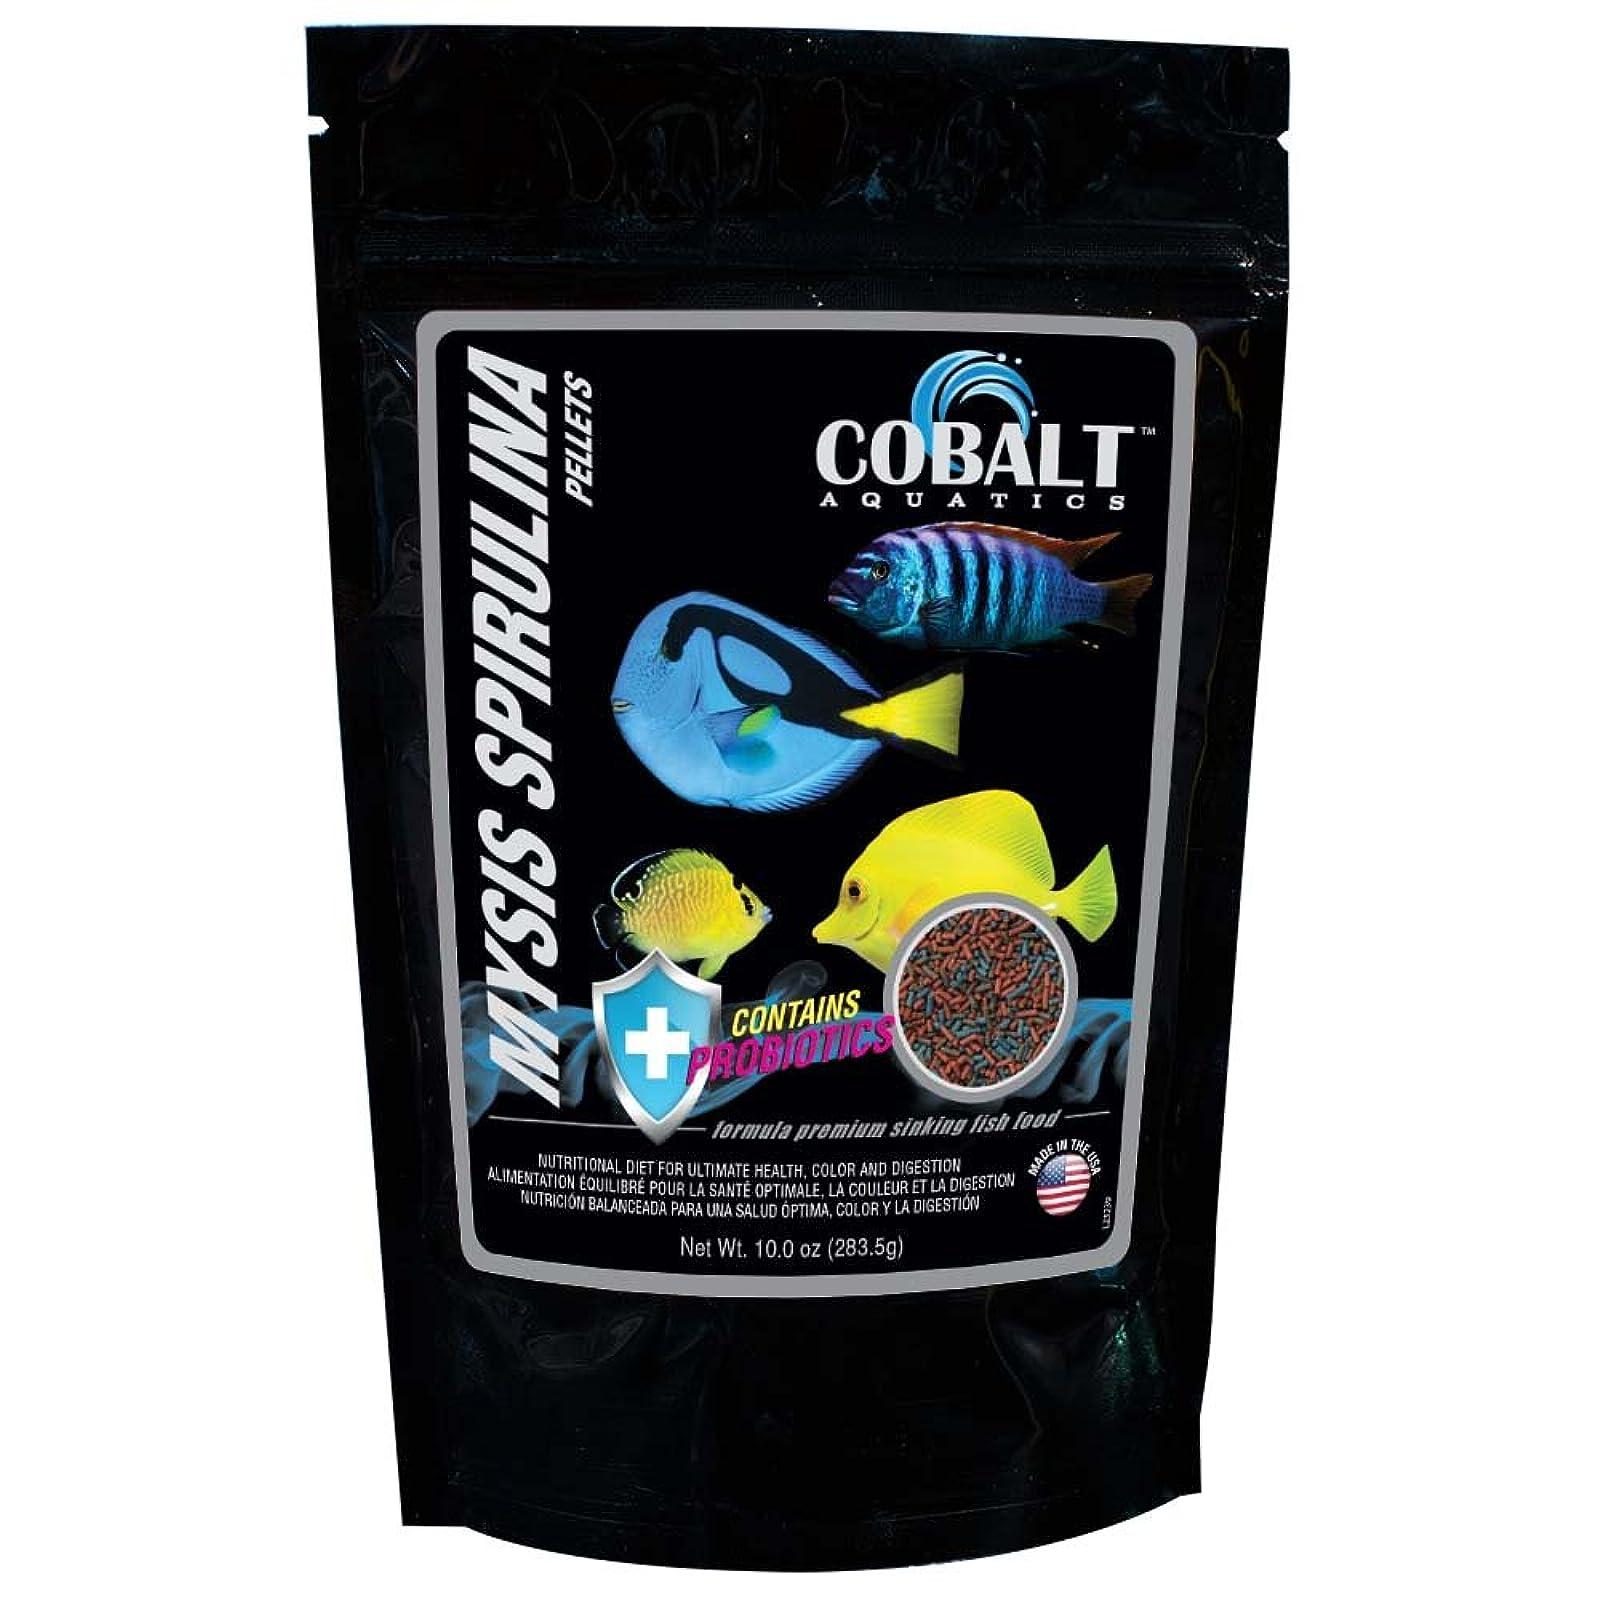 Cobalt Aquatics 10 oz Mysis Spirulina Pellet 23239 - 1